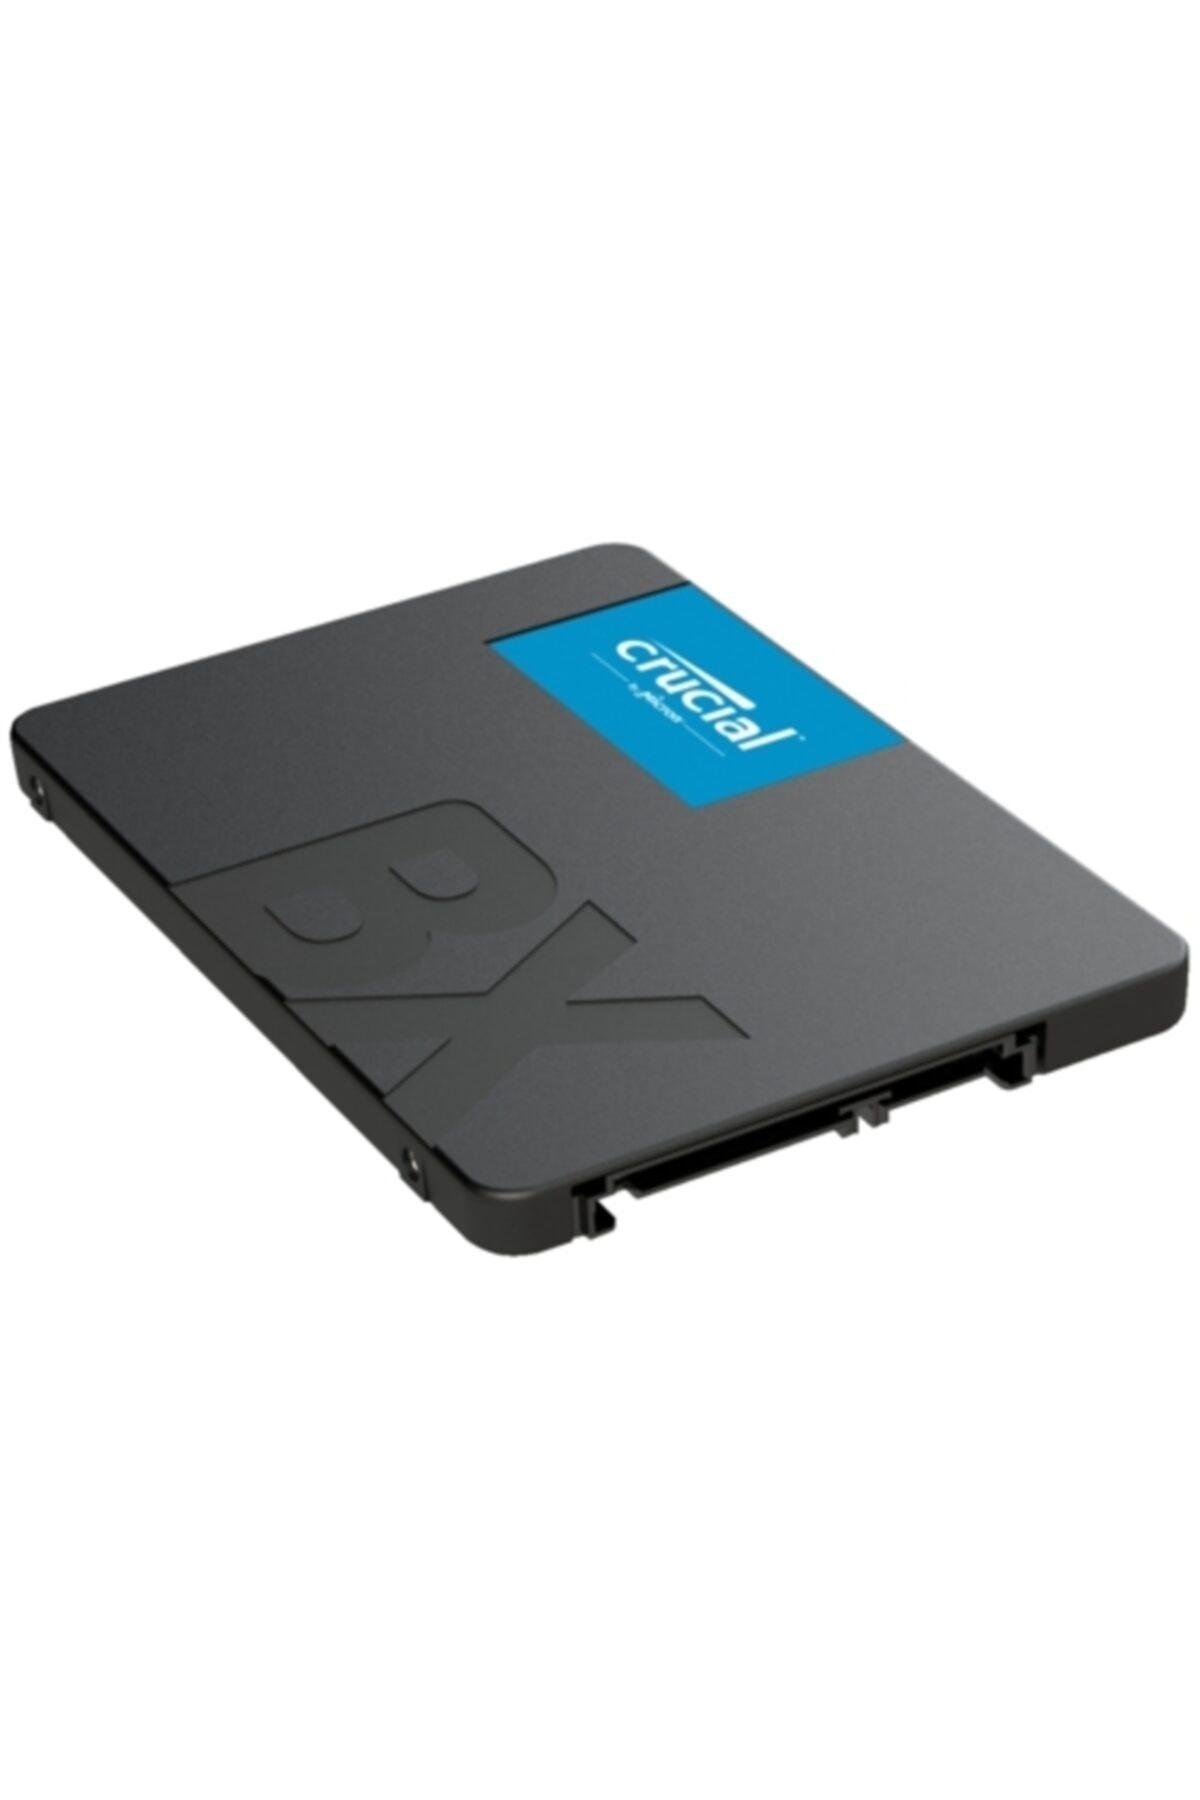 Bx500 Ct240bx500ssd1 240gb 540- 500mb/s Ssd Sata-3 Disk